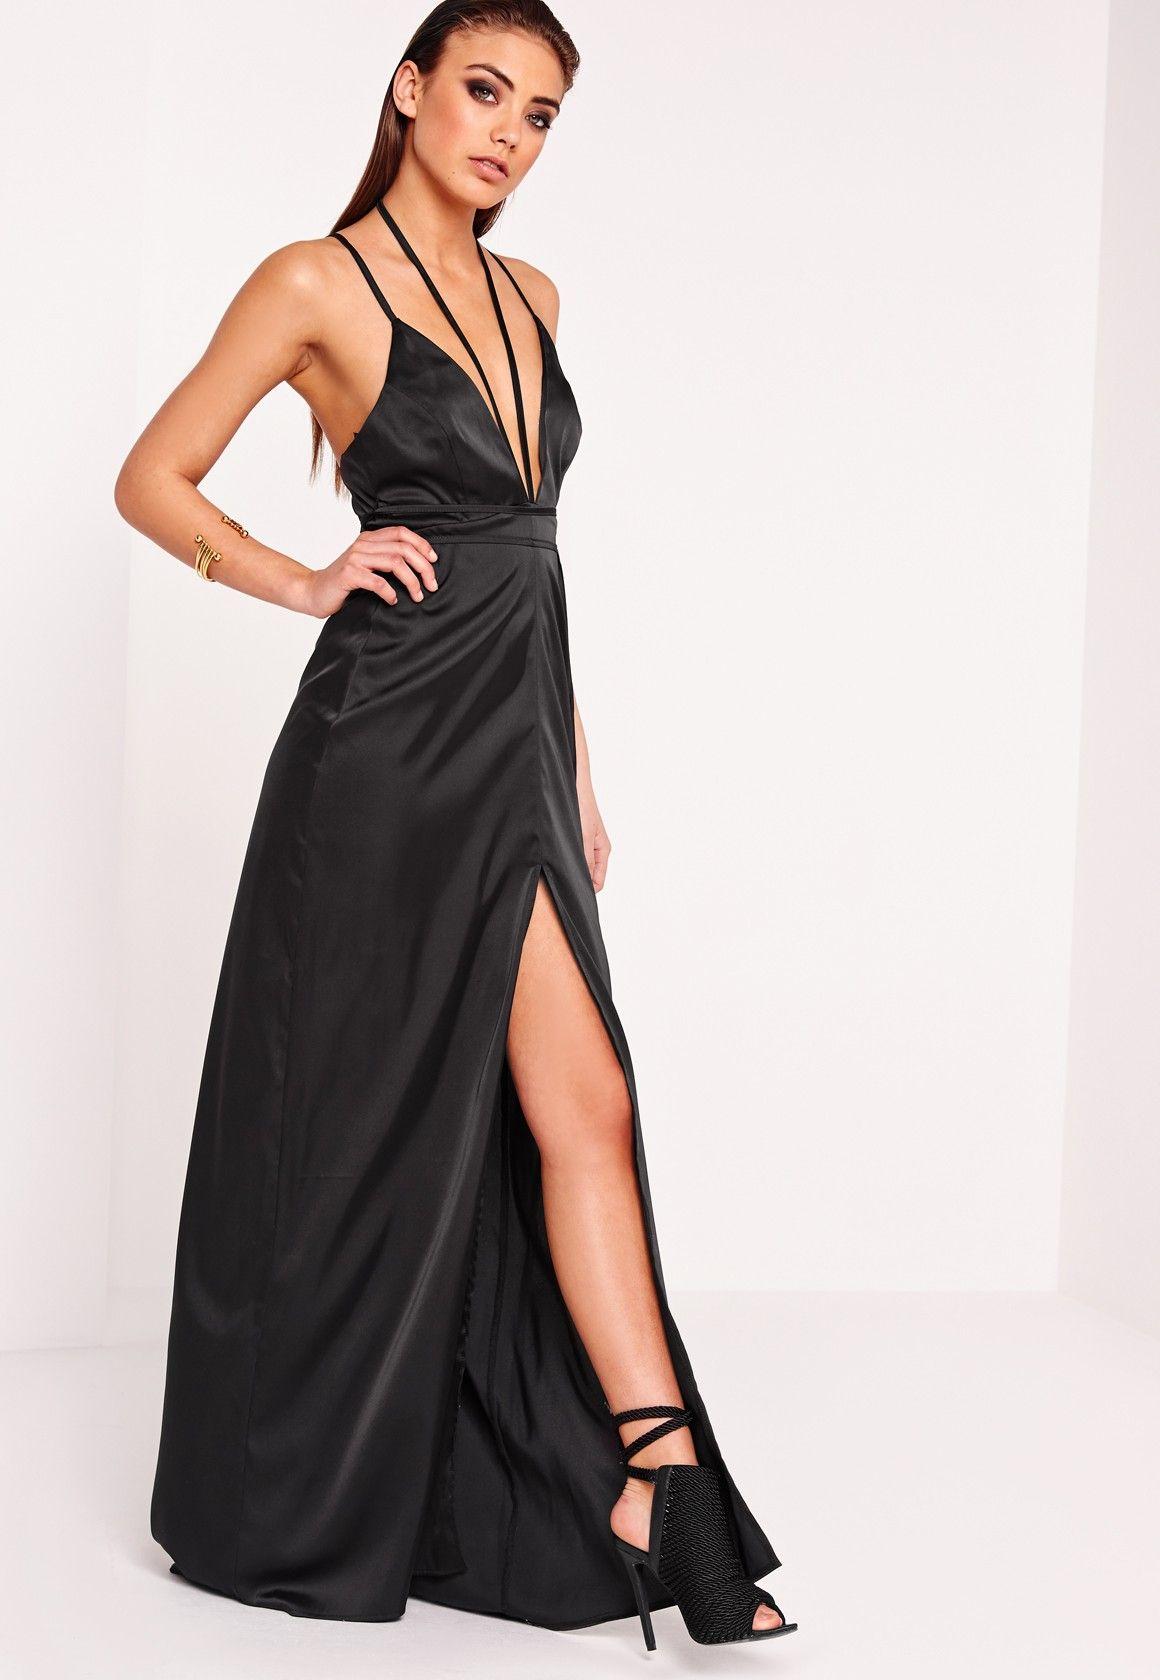 e4b9fc242d0 Missguided - Peace Love Satin Tie Waist Maxi Dress Black